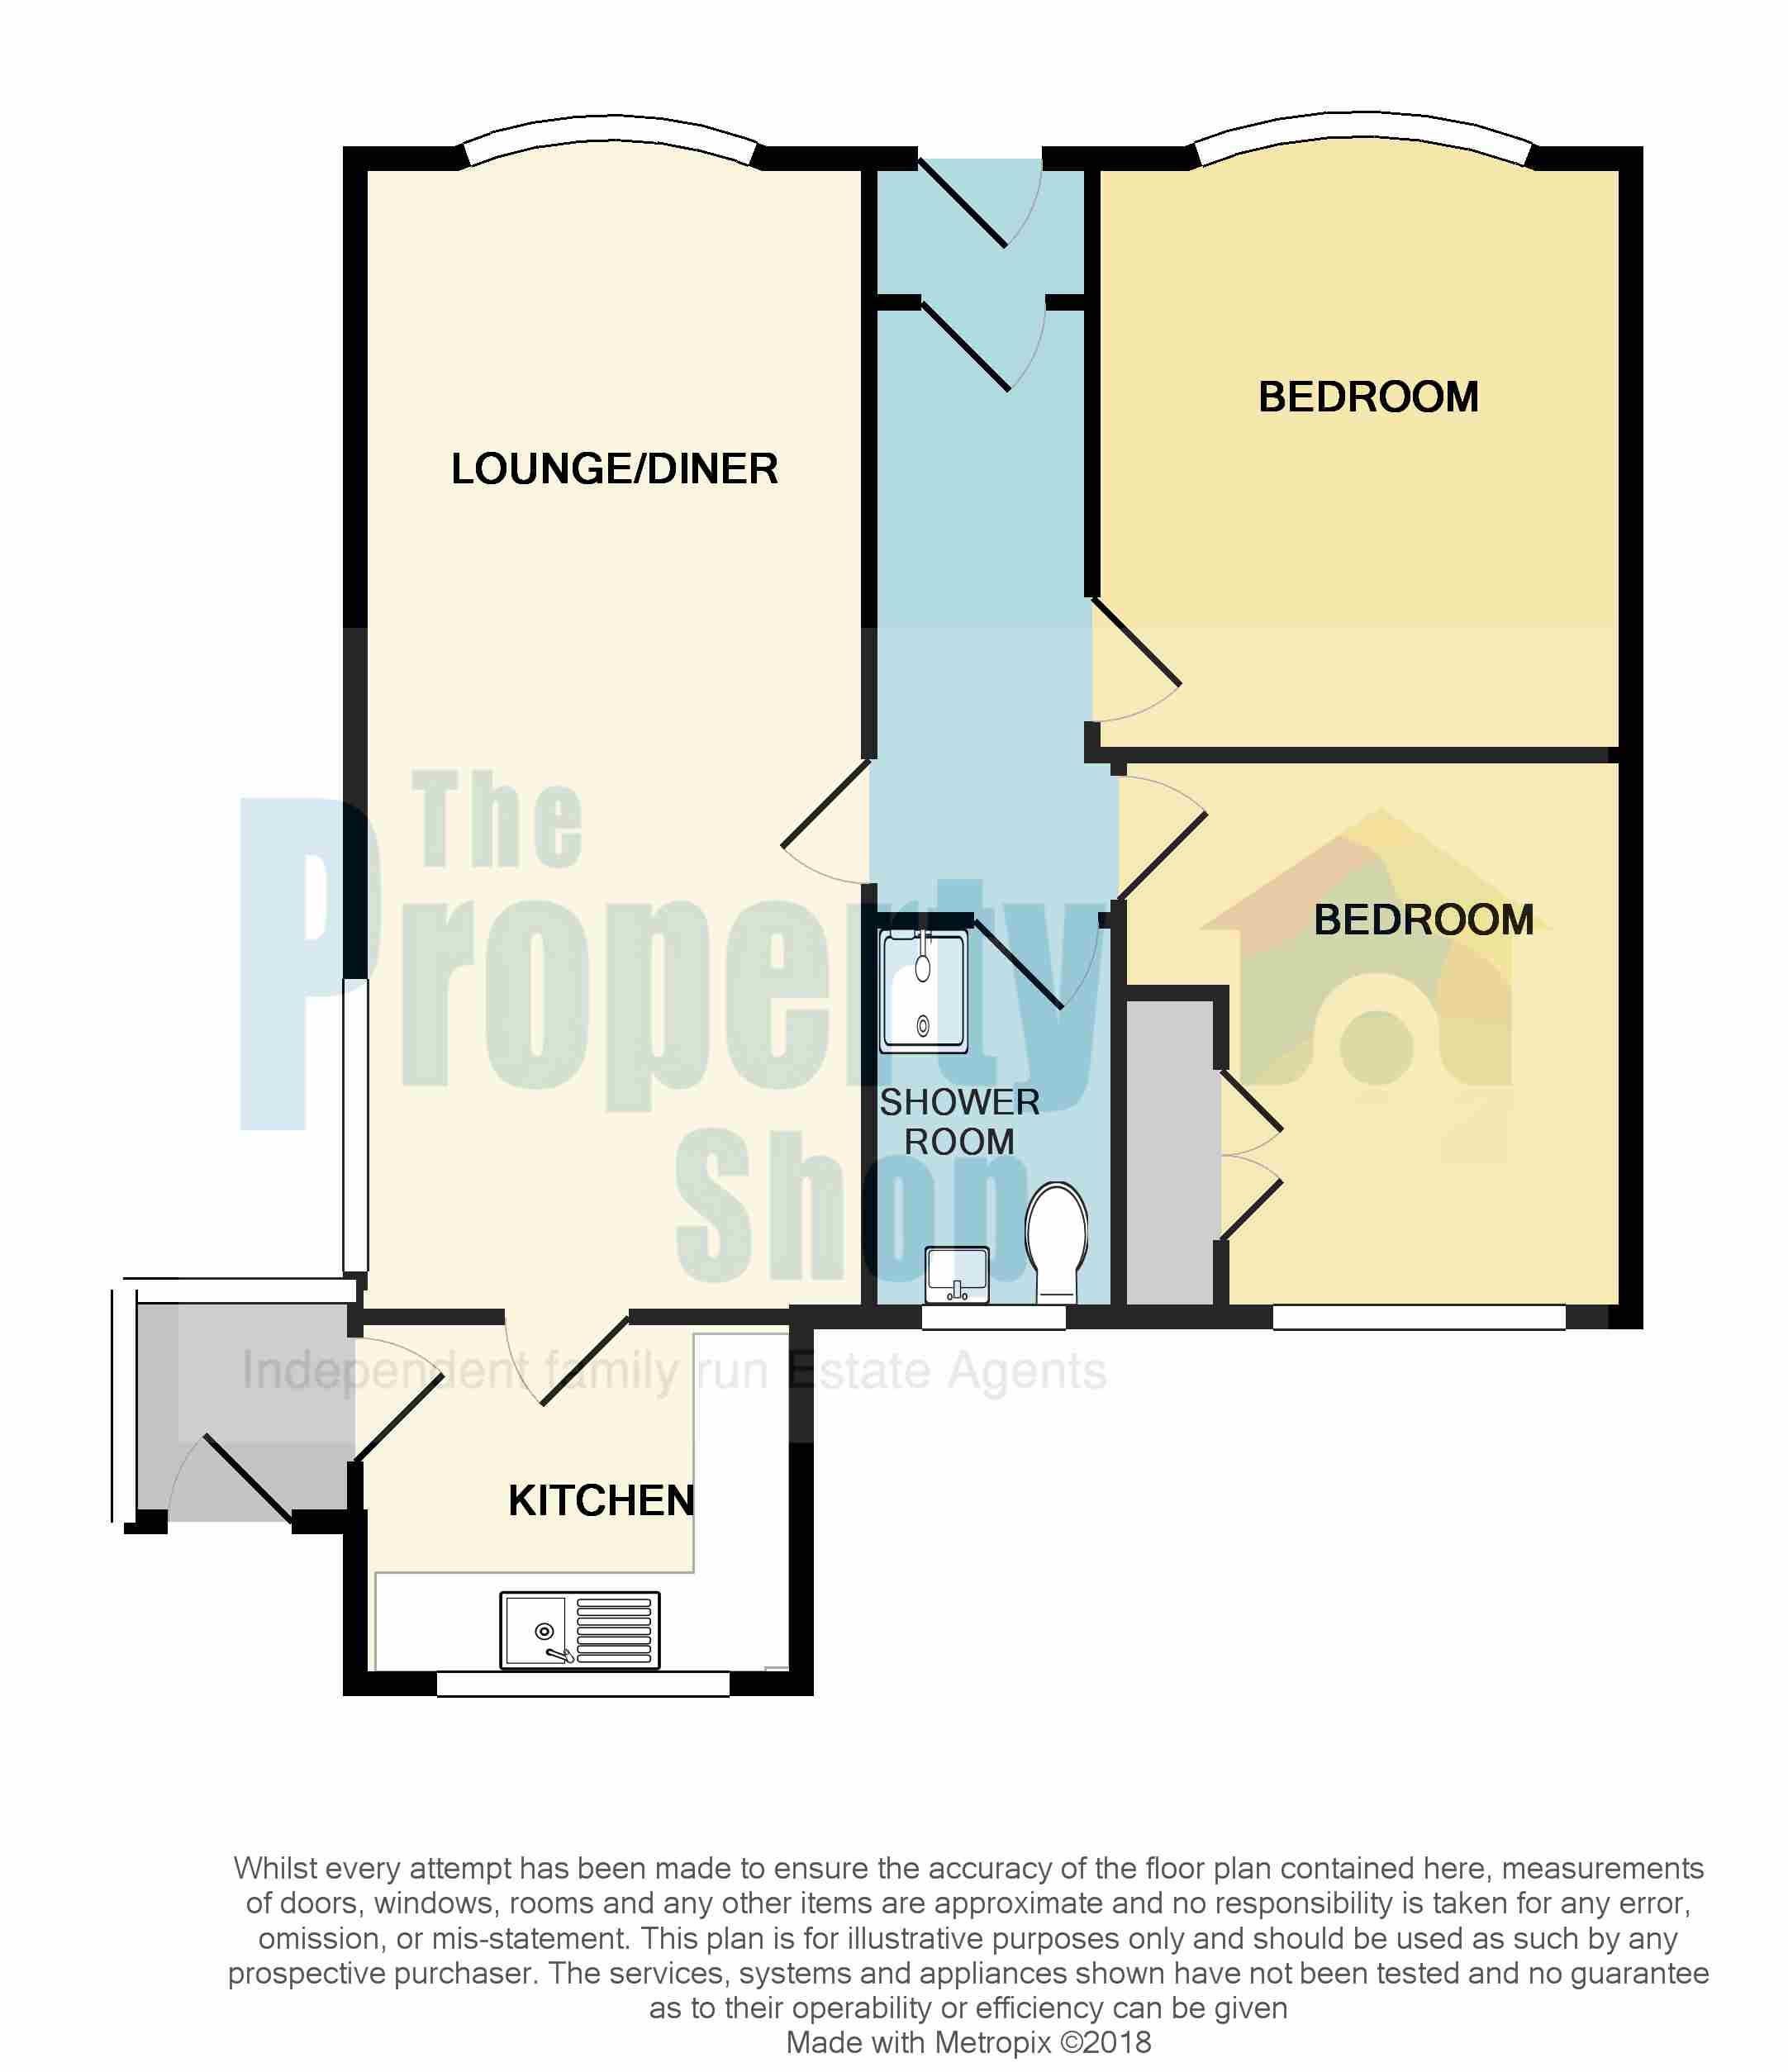 Christ Church Harbor Apartments: Siddons Road, Coseley, Bilston WV14, 2 Bedroom Detached